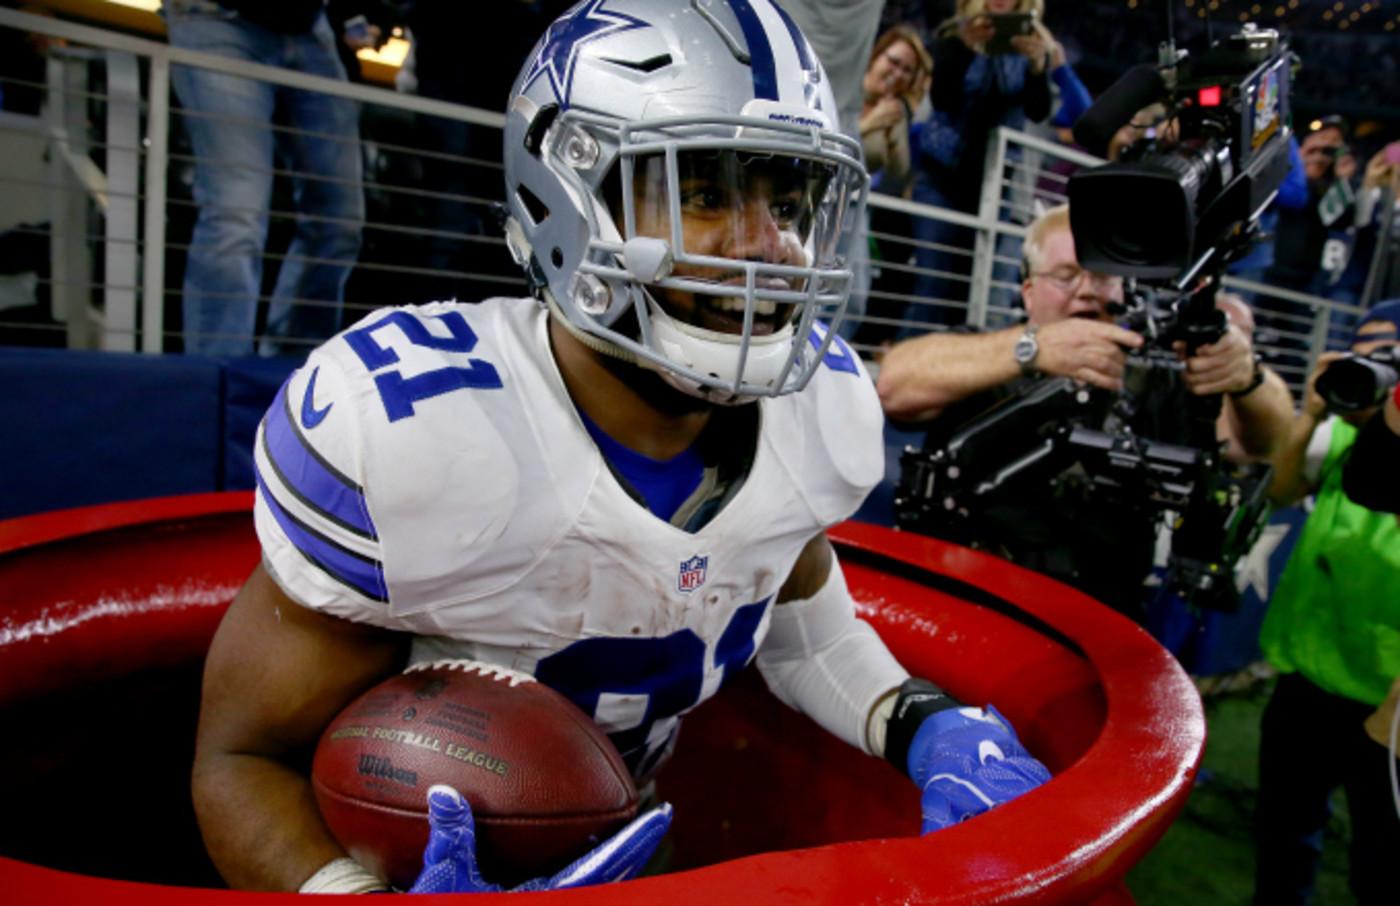 Ezekiel Elliott #21 of the Dallas Cowboys celebrates after scoring a touchdown